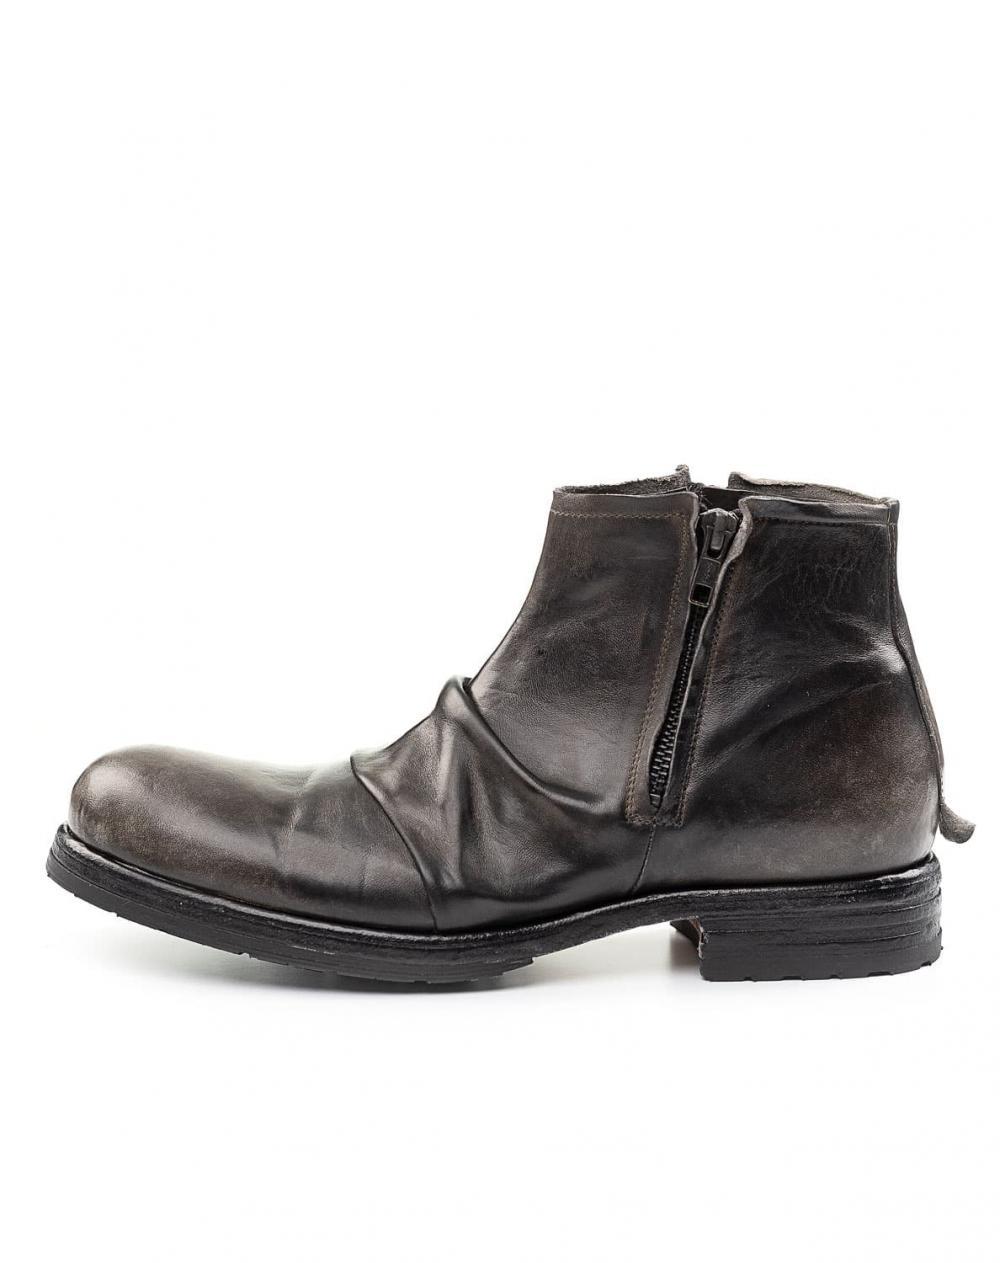 Boot Horse Oliva Caos